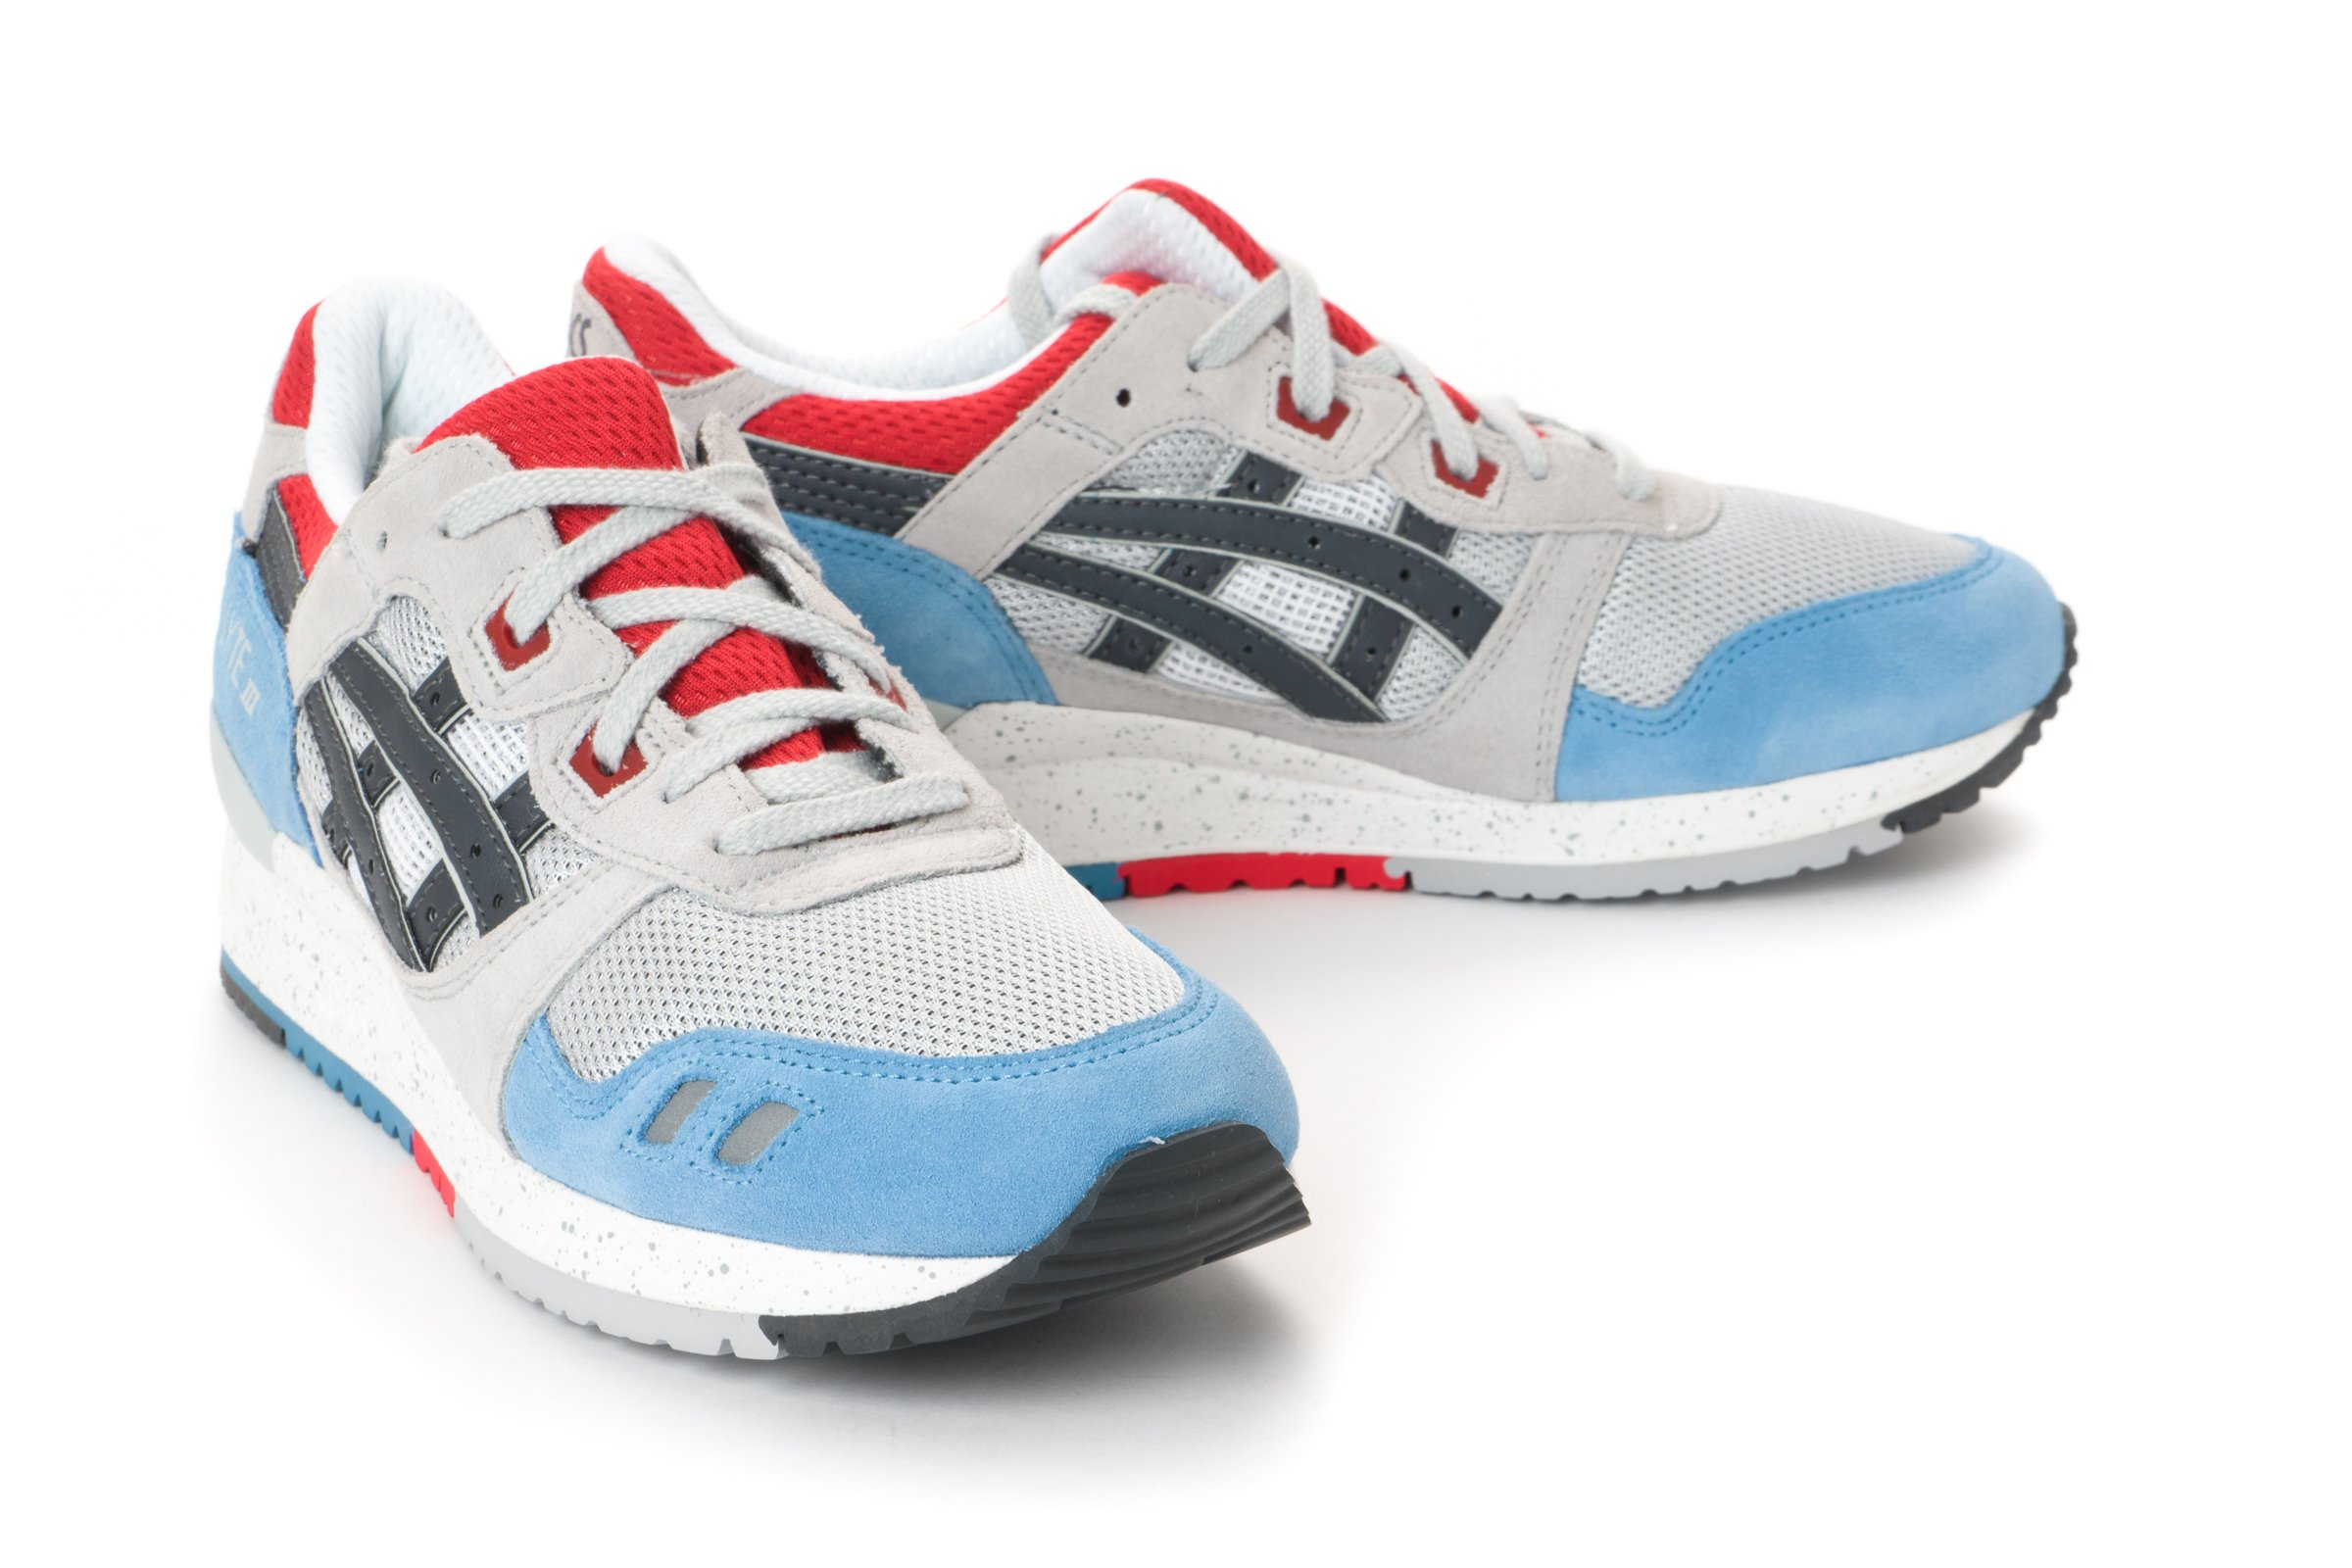 pretty nice 6242e 84c71 Galleon - Asics Gel-Lyte III Running Casual Shoes H425N-1016 ...